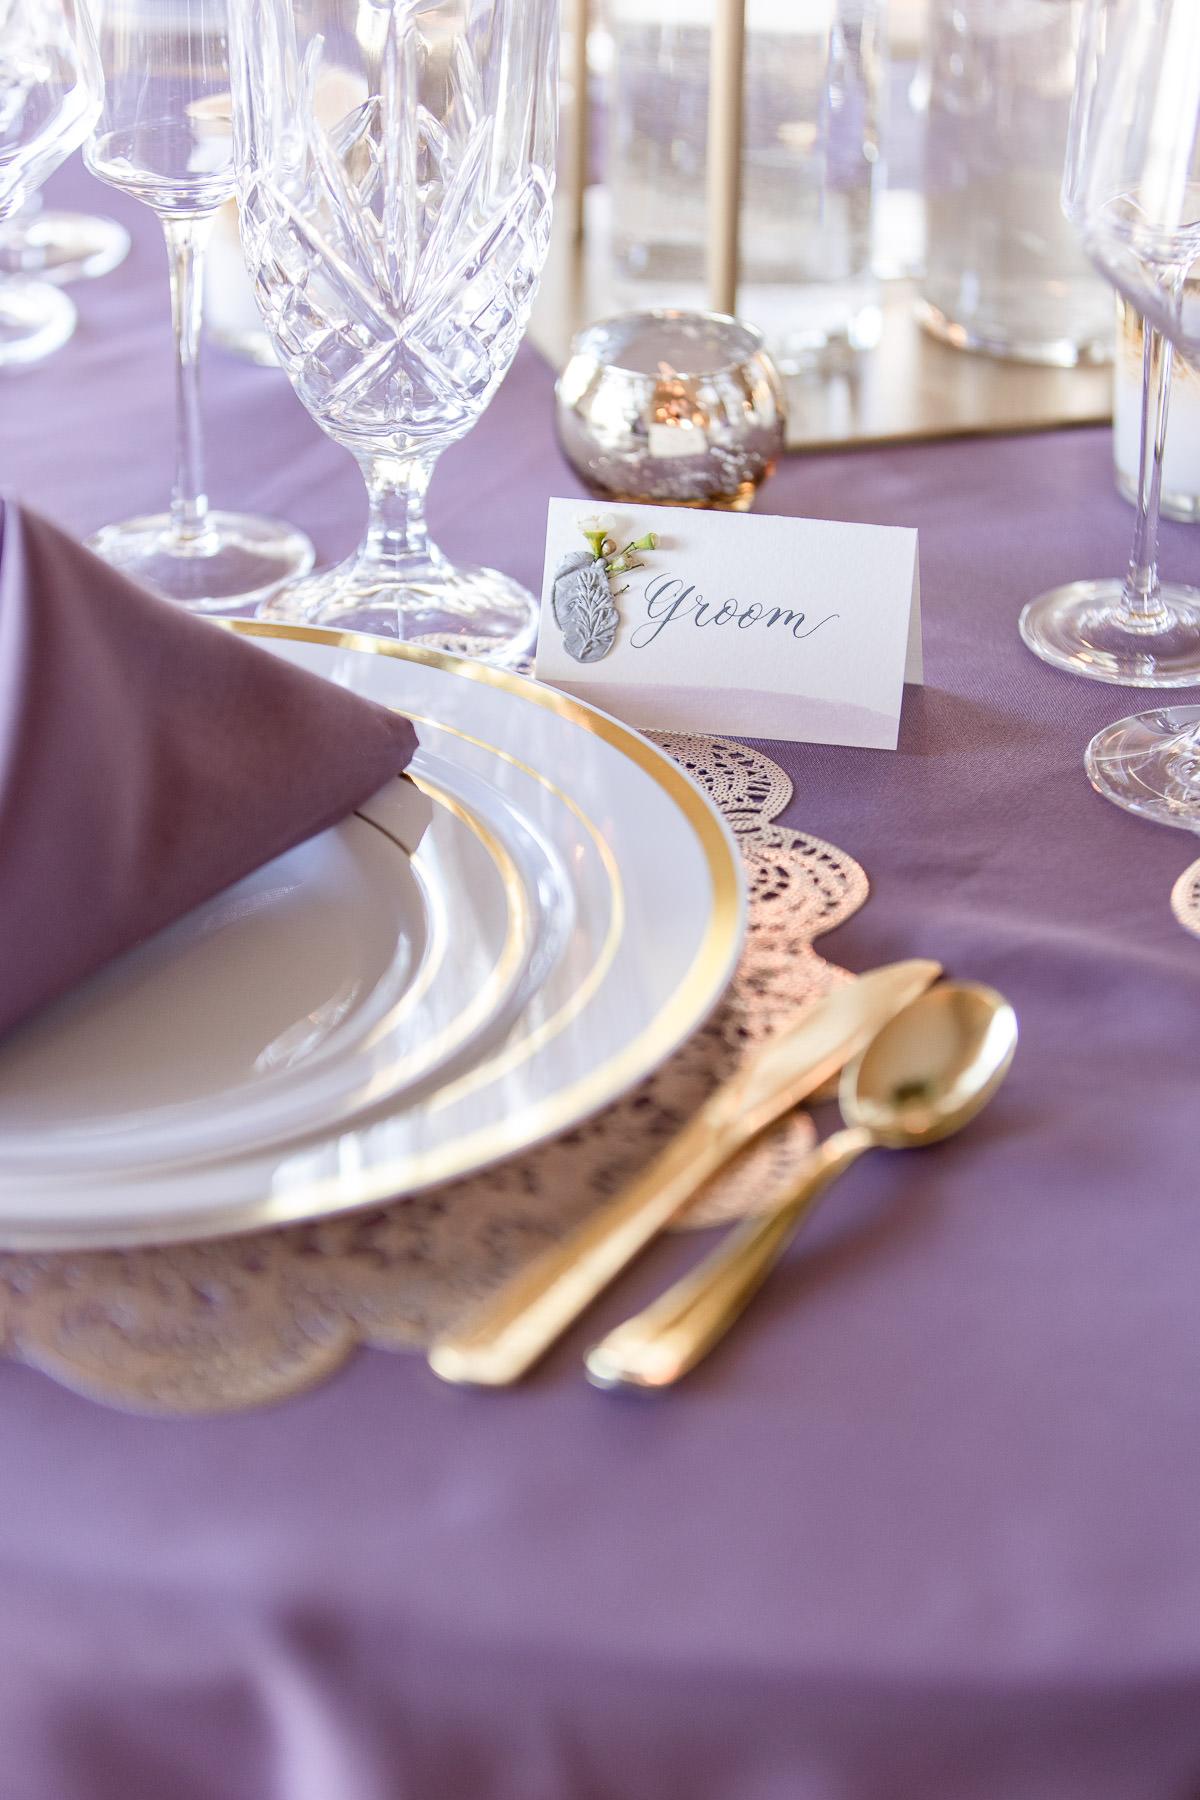 Eisenhower House, Newport, Rhode Island, Tracy Jenkins Photography, wedding, LGBTQ+, LGBT, Gay, Inclusive, Photography, Wedding photography, table setting, groom, lavender, gold